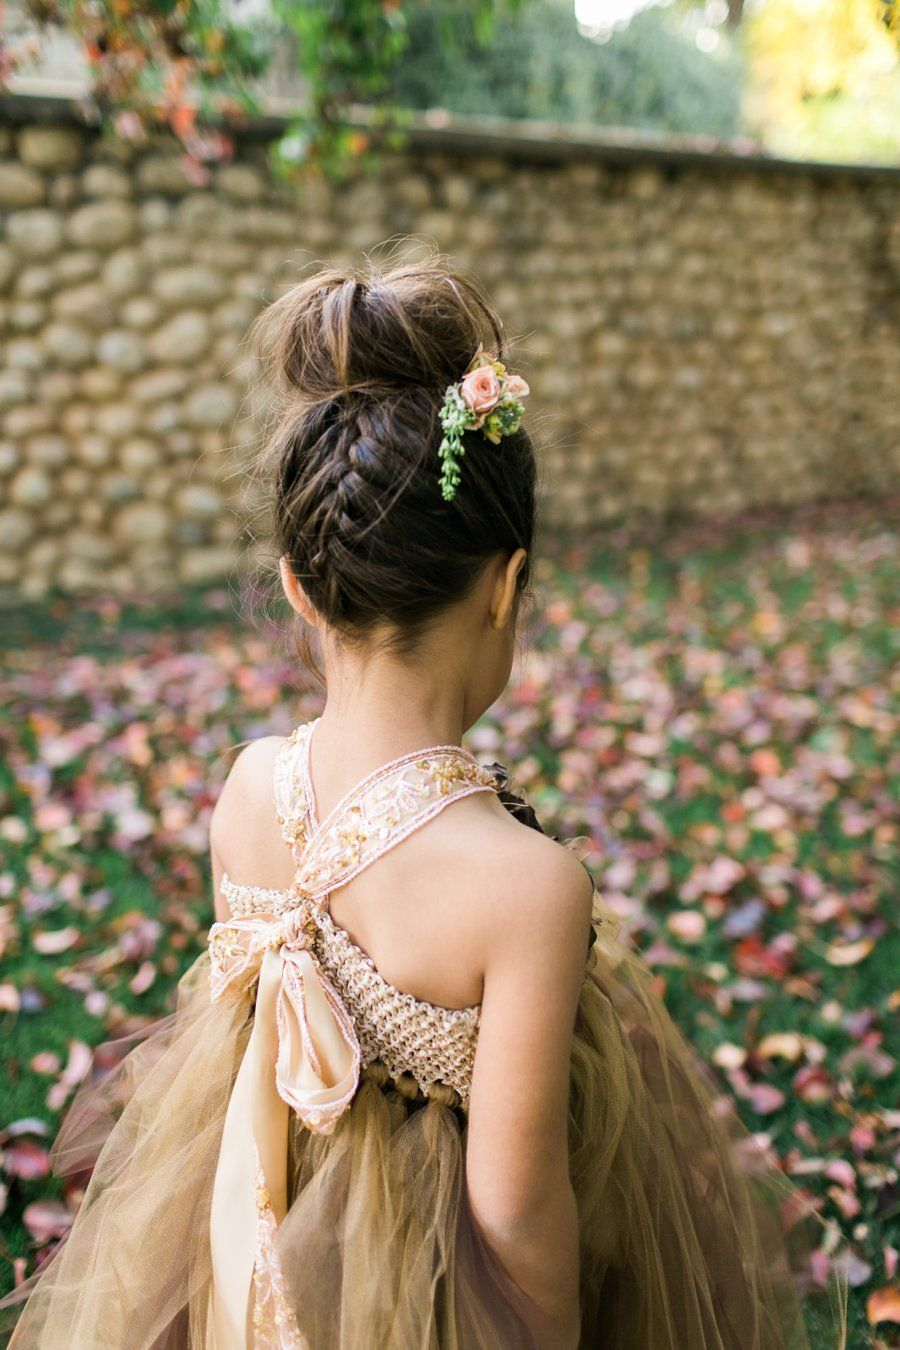 Forestinspired indoor wedding hair pinterest brittany floral